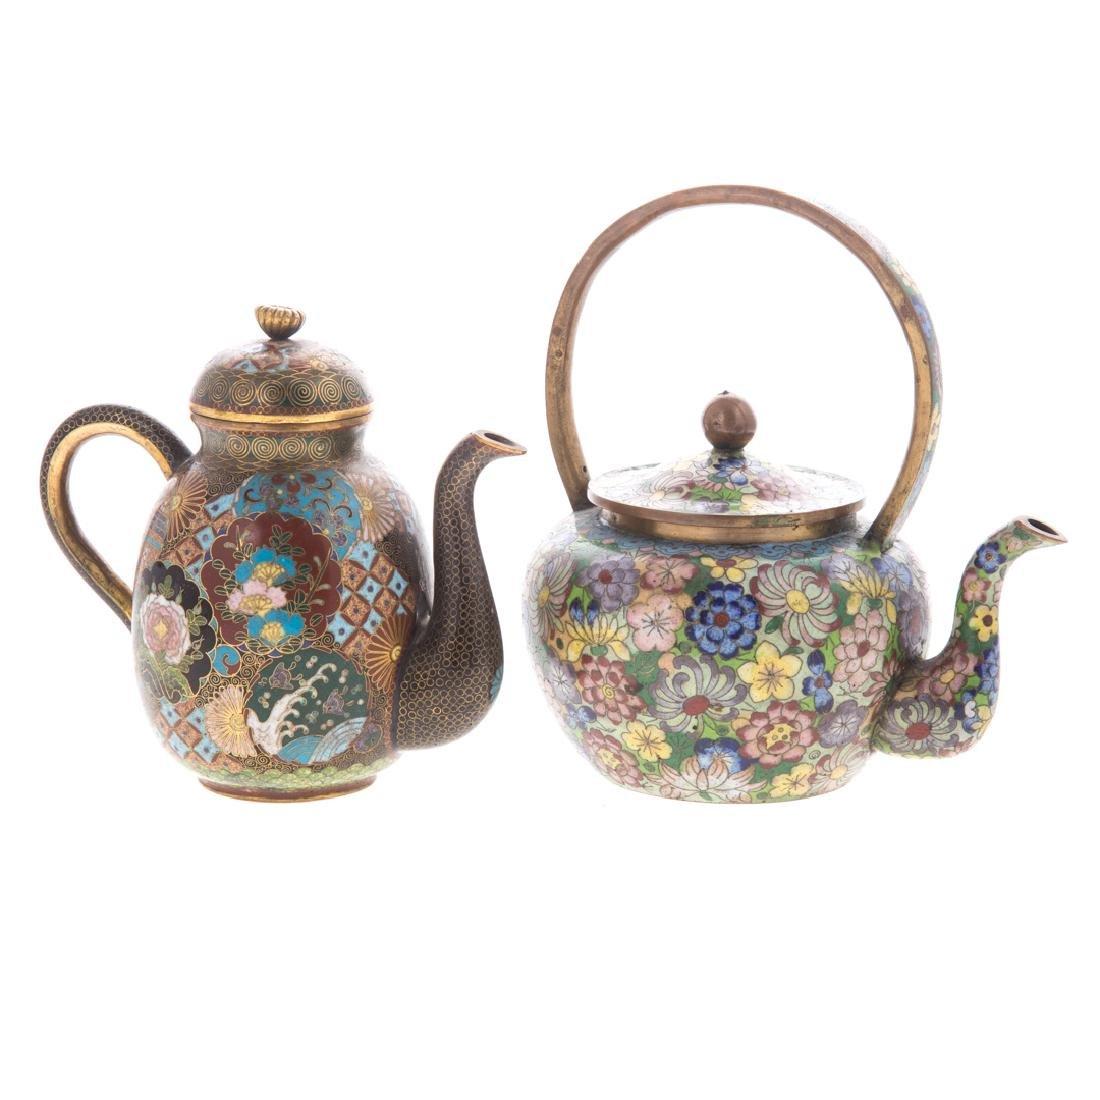 Two Asian cloisonne enamel teapots